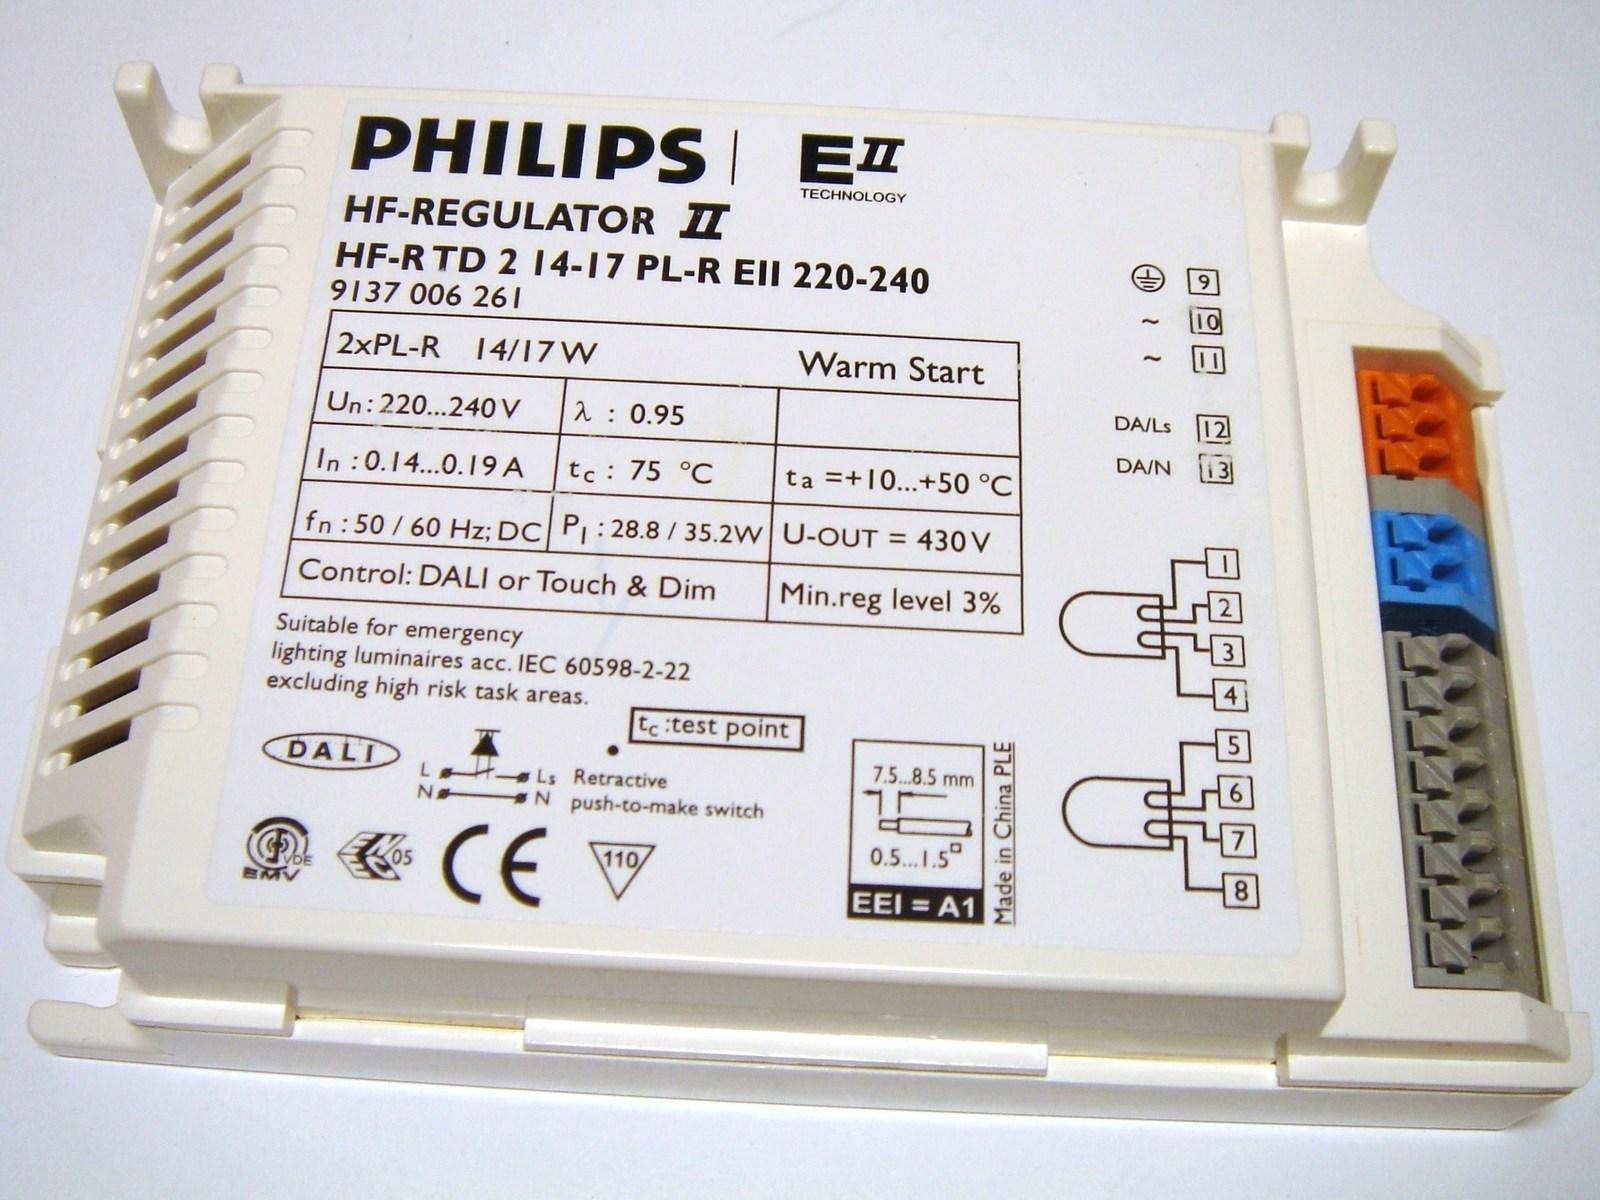 Elektrooniline drossel 2 x14/17 W, Philips, HF-Regulator, HF-R TD2 14-17 PL-R EII220-240V, 9137006261